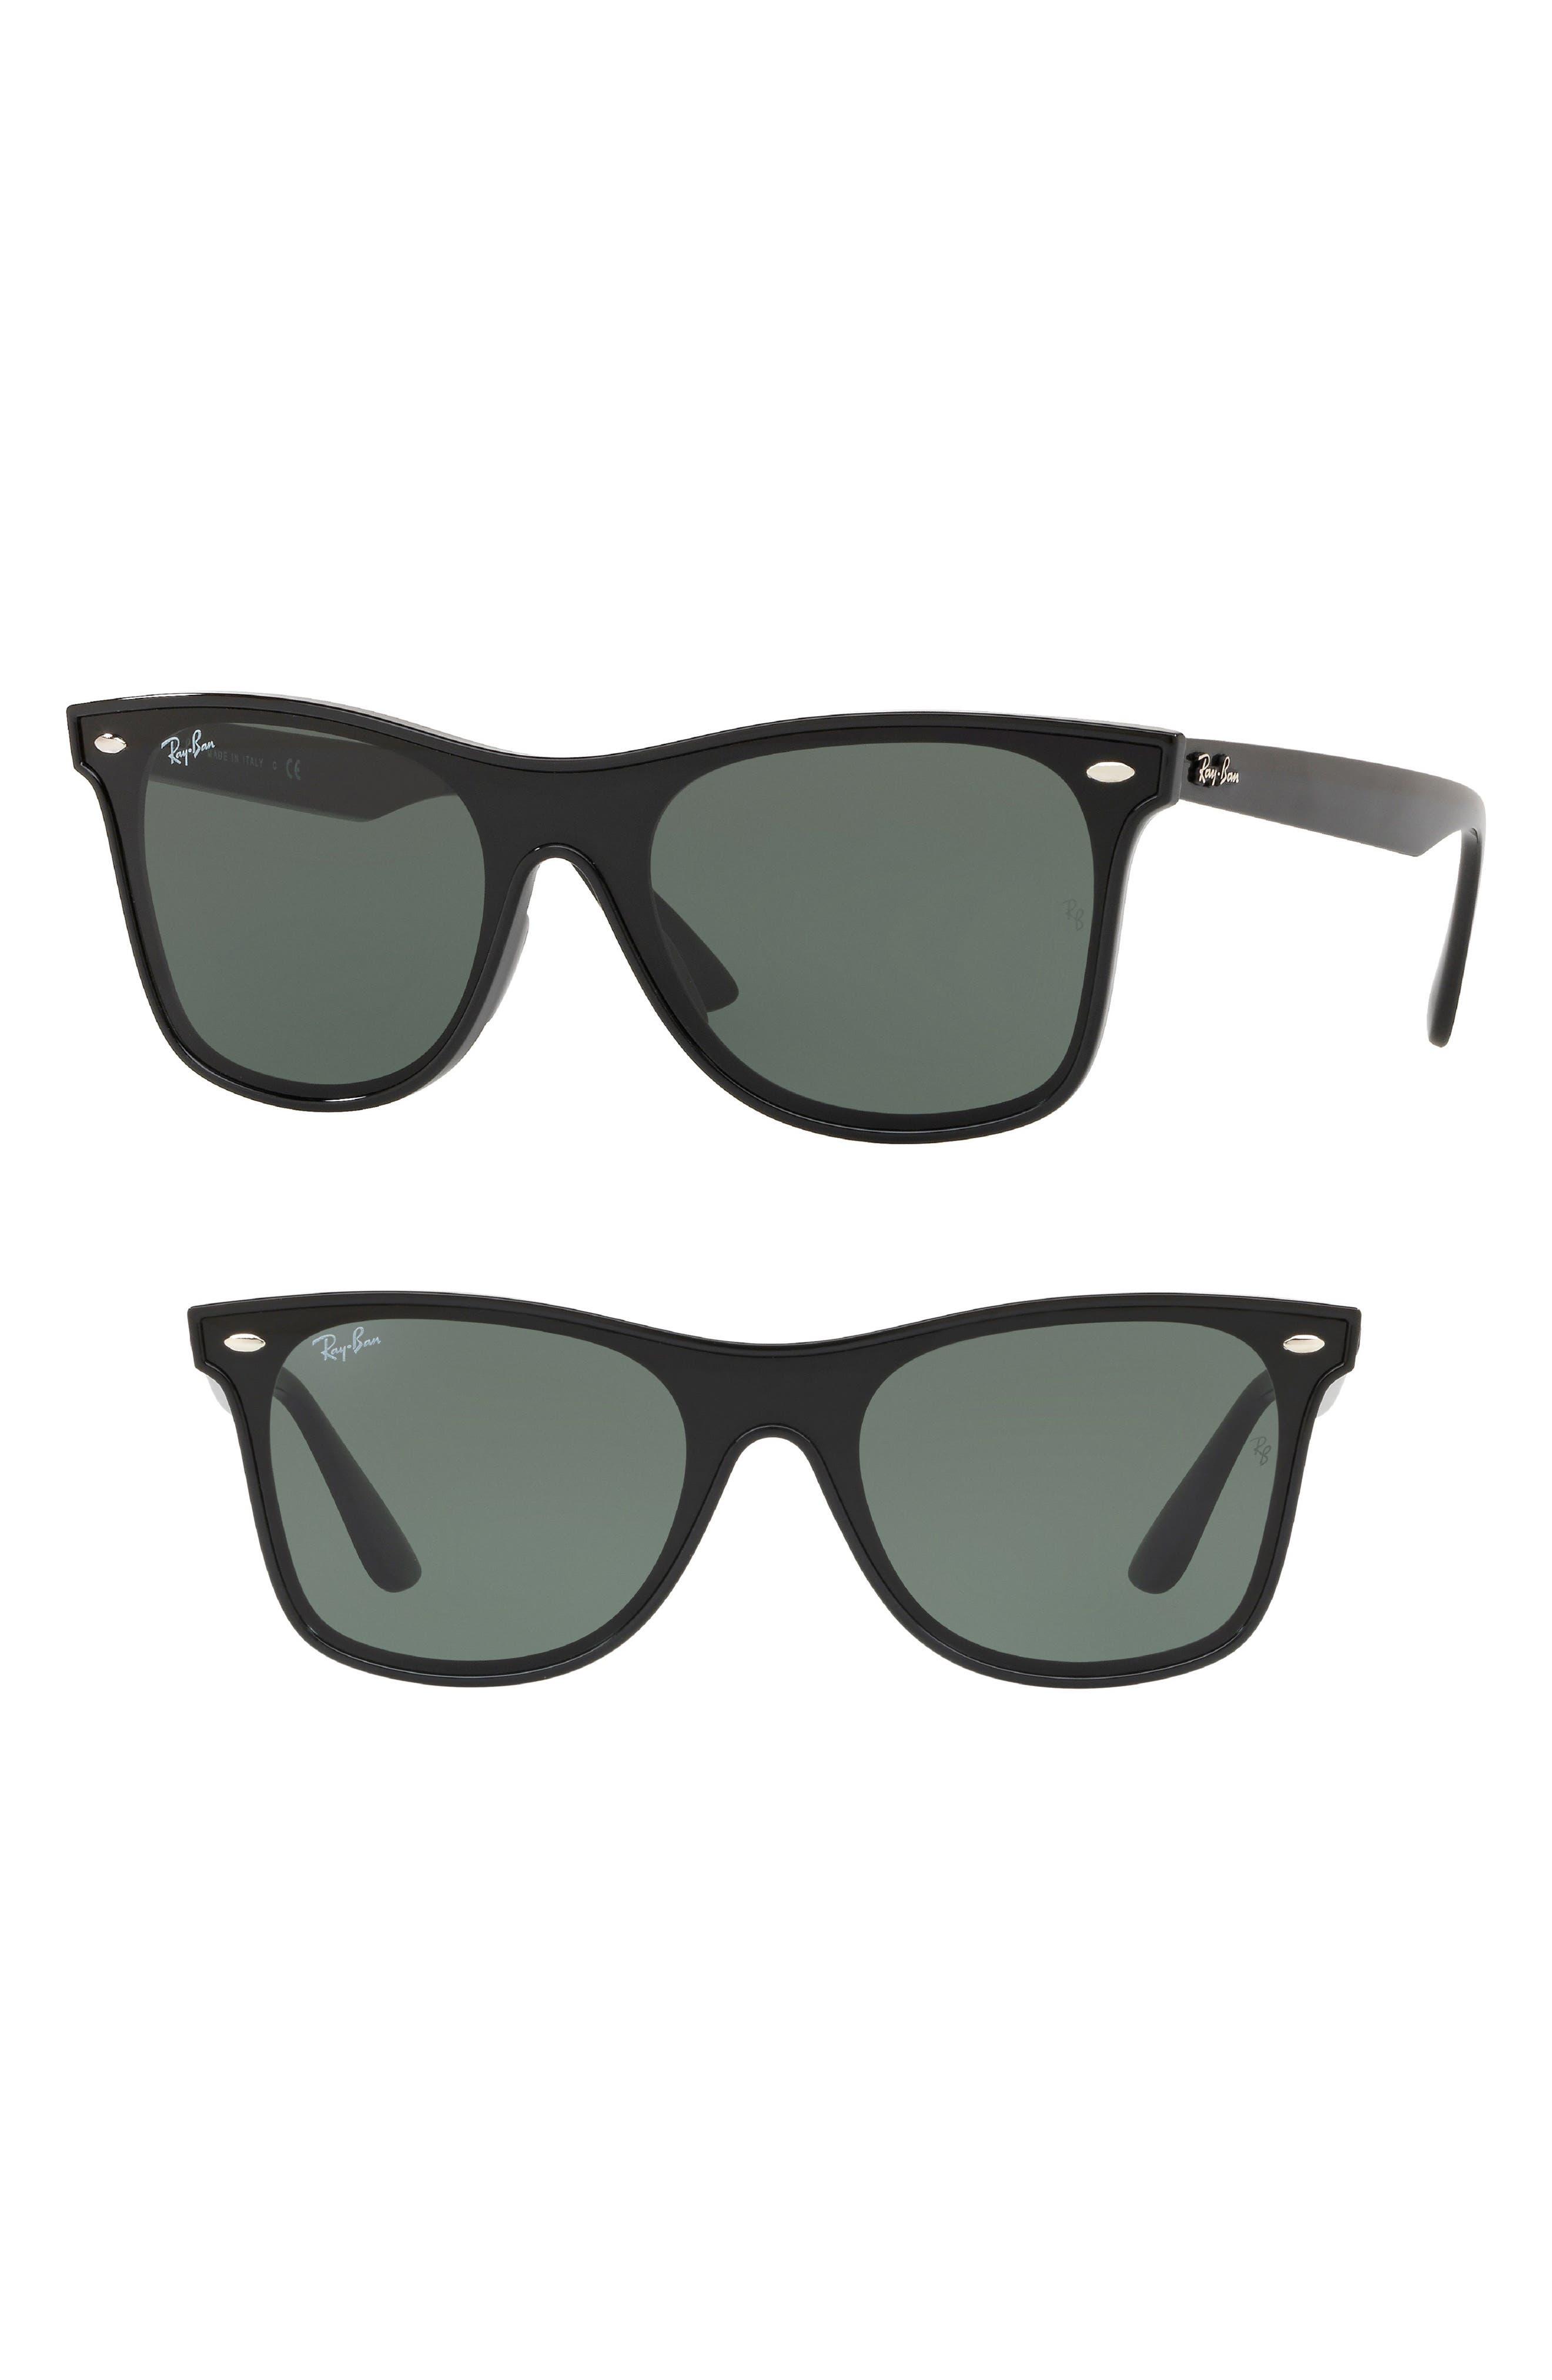 Ray-Ban Blaze 41Mm Wayfarer Sunglasses - Black Solid